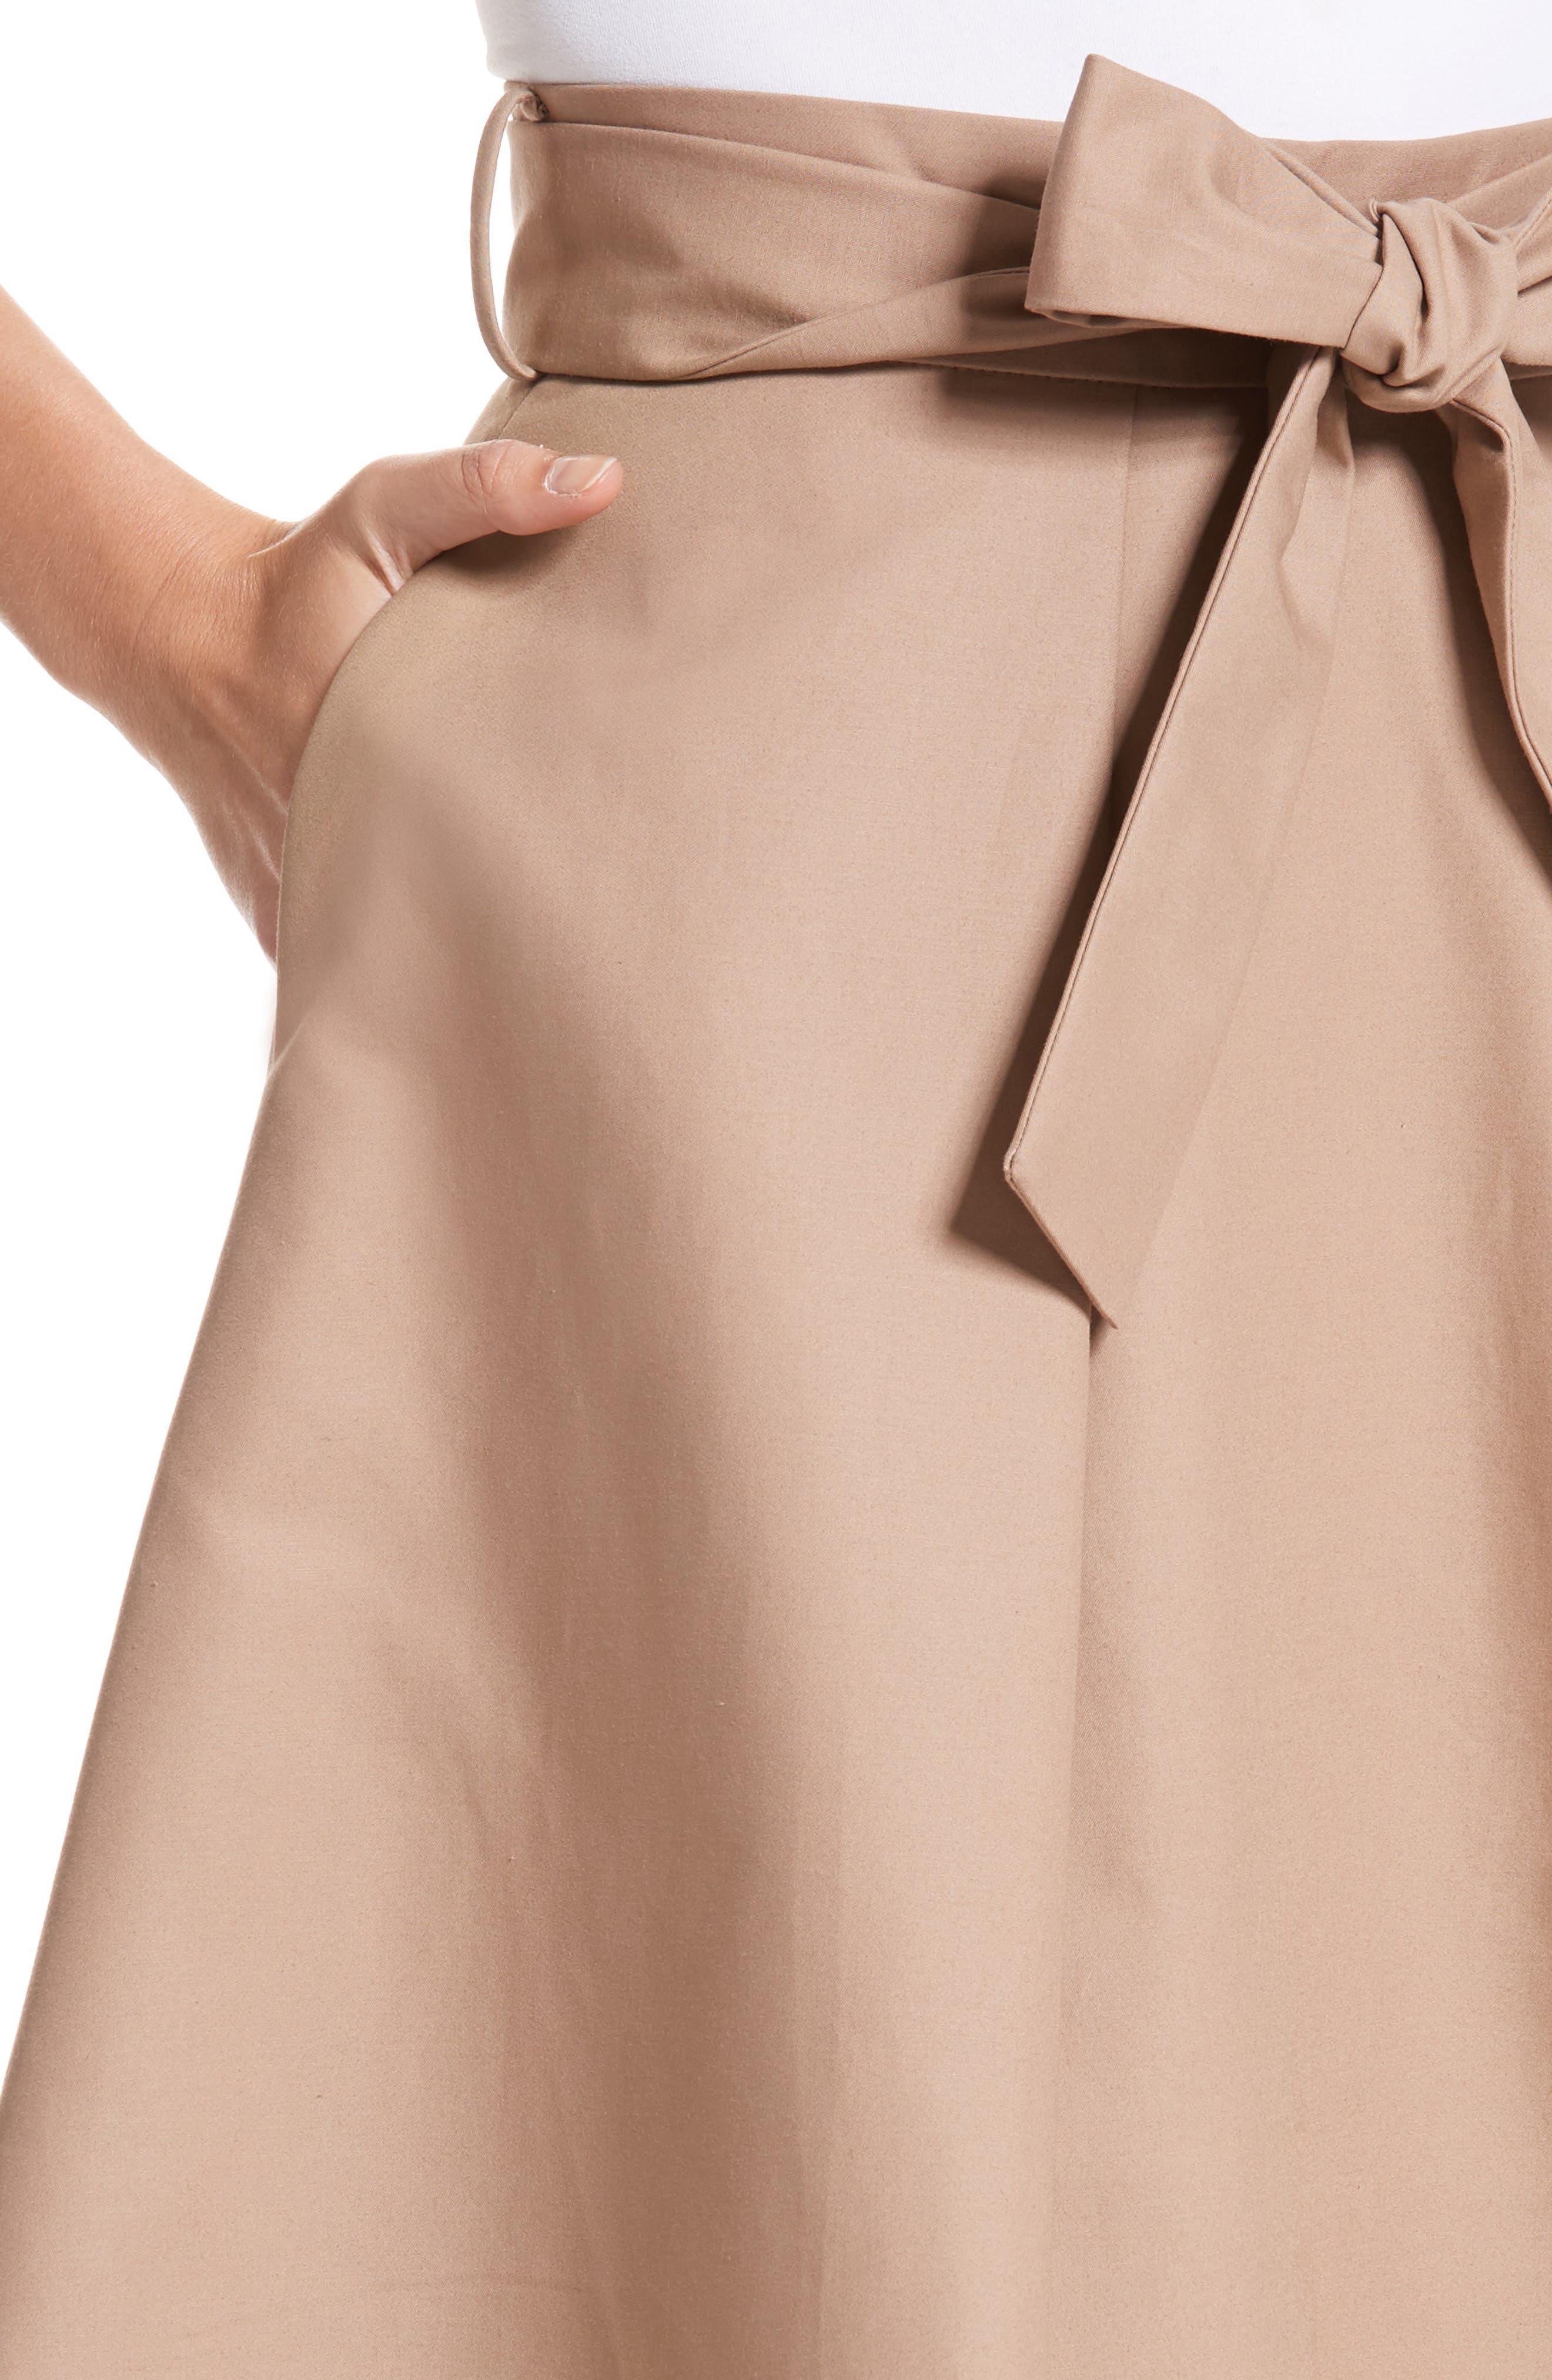 Belted Cotton Skirt,                             Alternate thumbnail 4, color,                             240